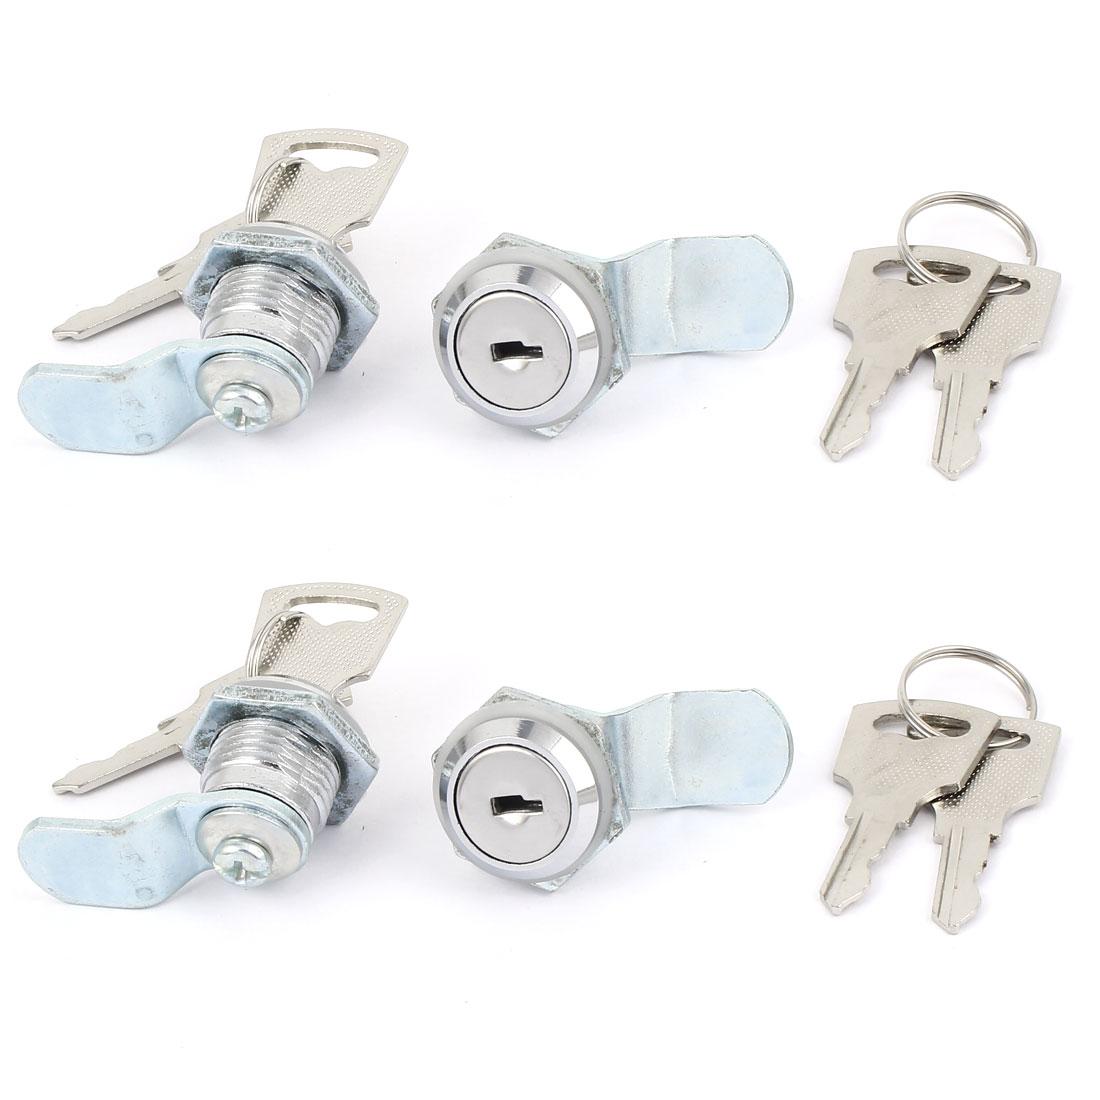 4 Pcs Door Cabinet Cross Shaped Metal Core Cam Lock with 2 Keys